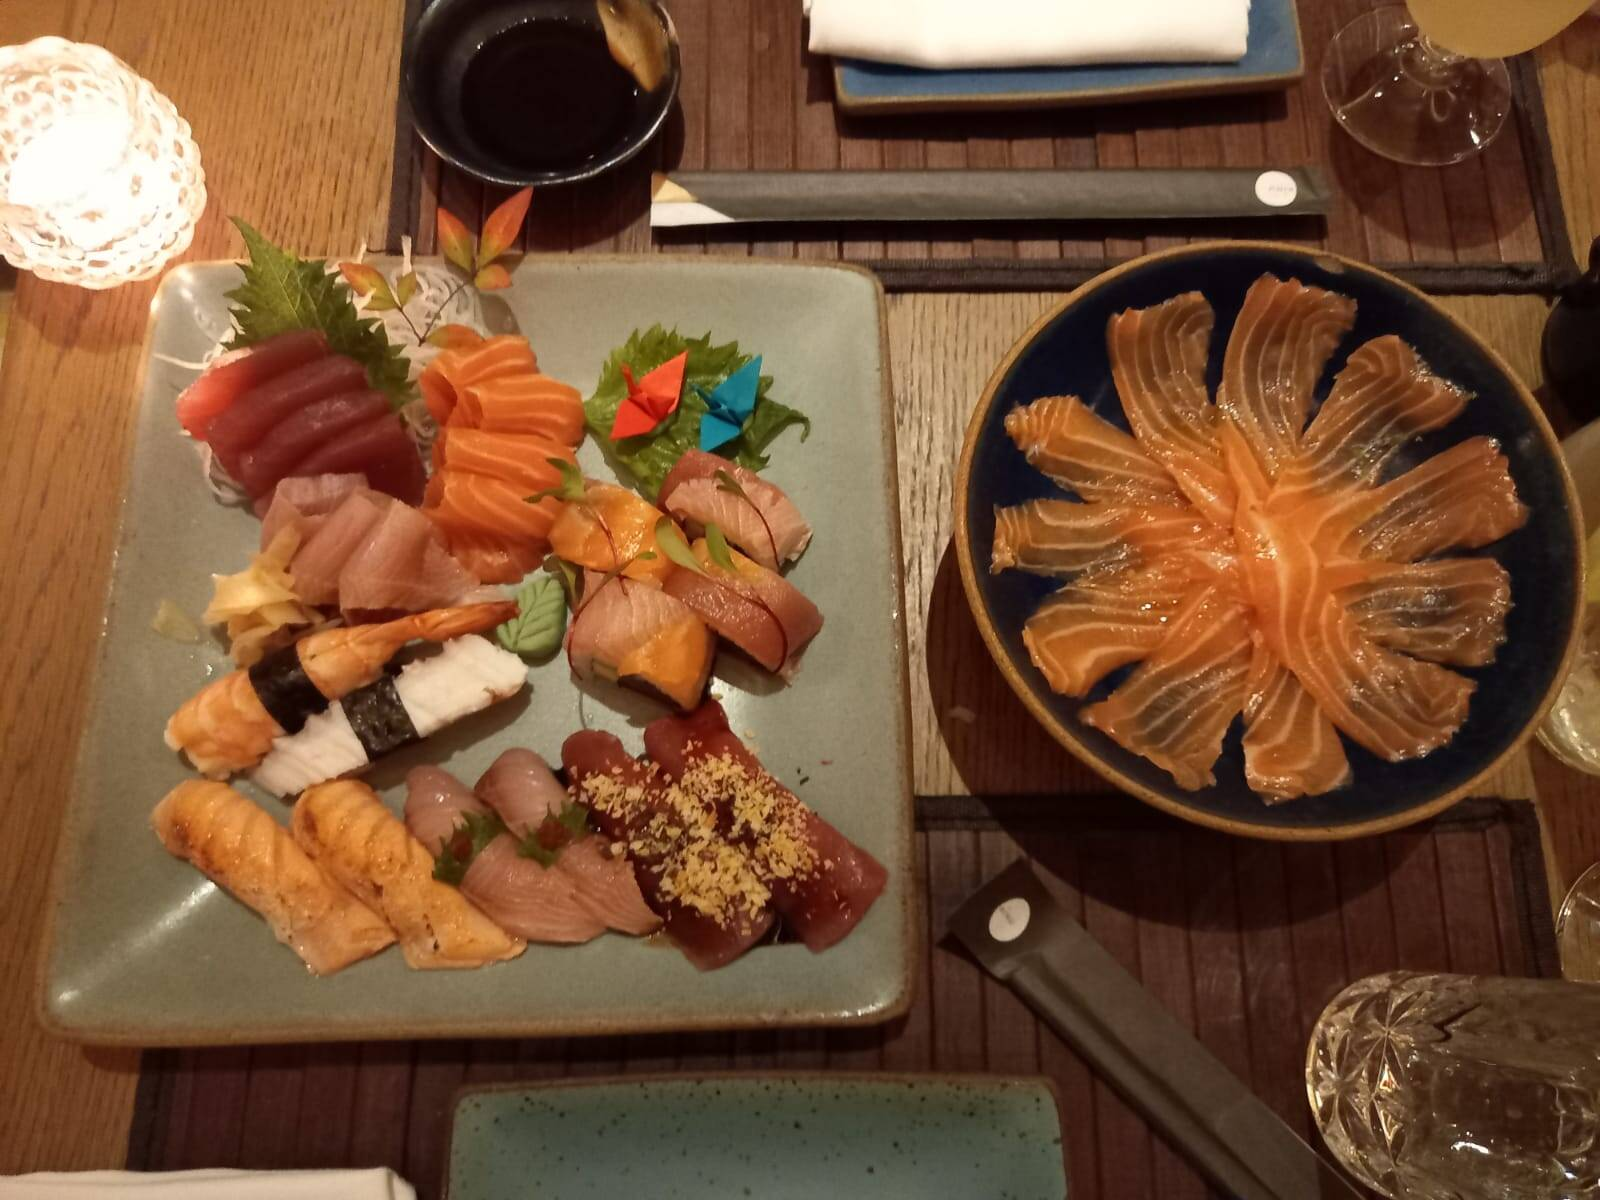 O combinado misto (esquerda), prato principal do cardápido exclusivo, e o Usuzukuri (direita), a entrada. Foto: Portal iG/Camila Cetrone